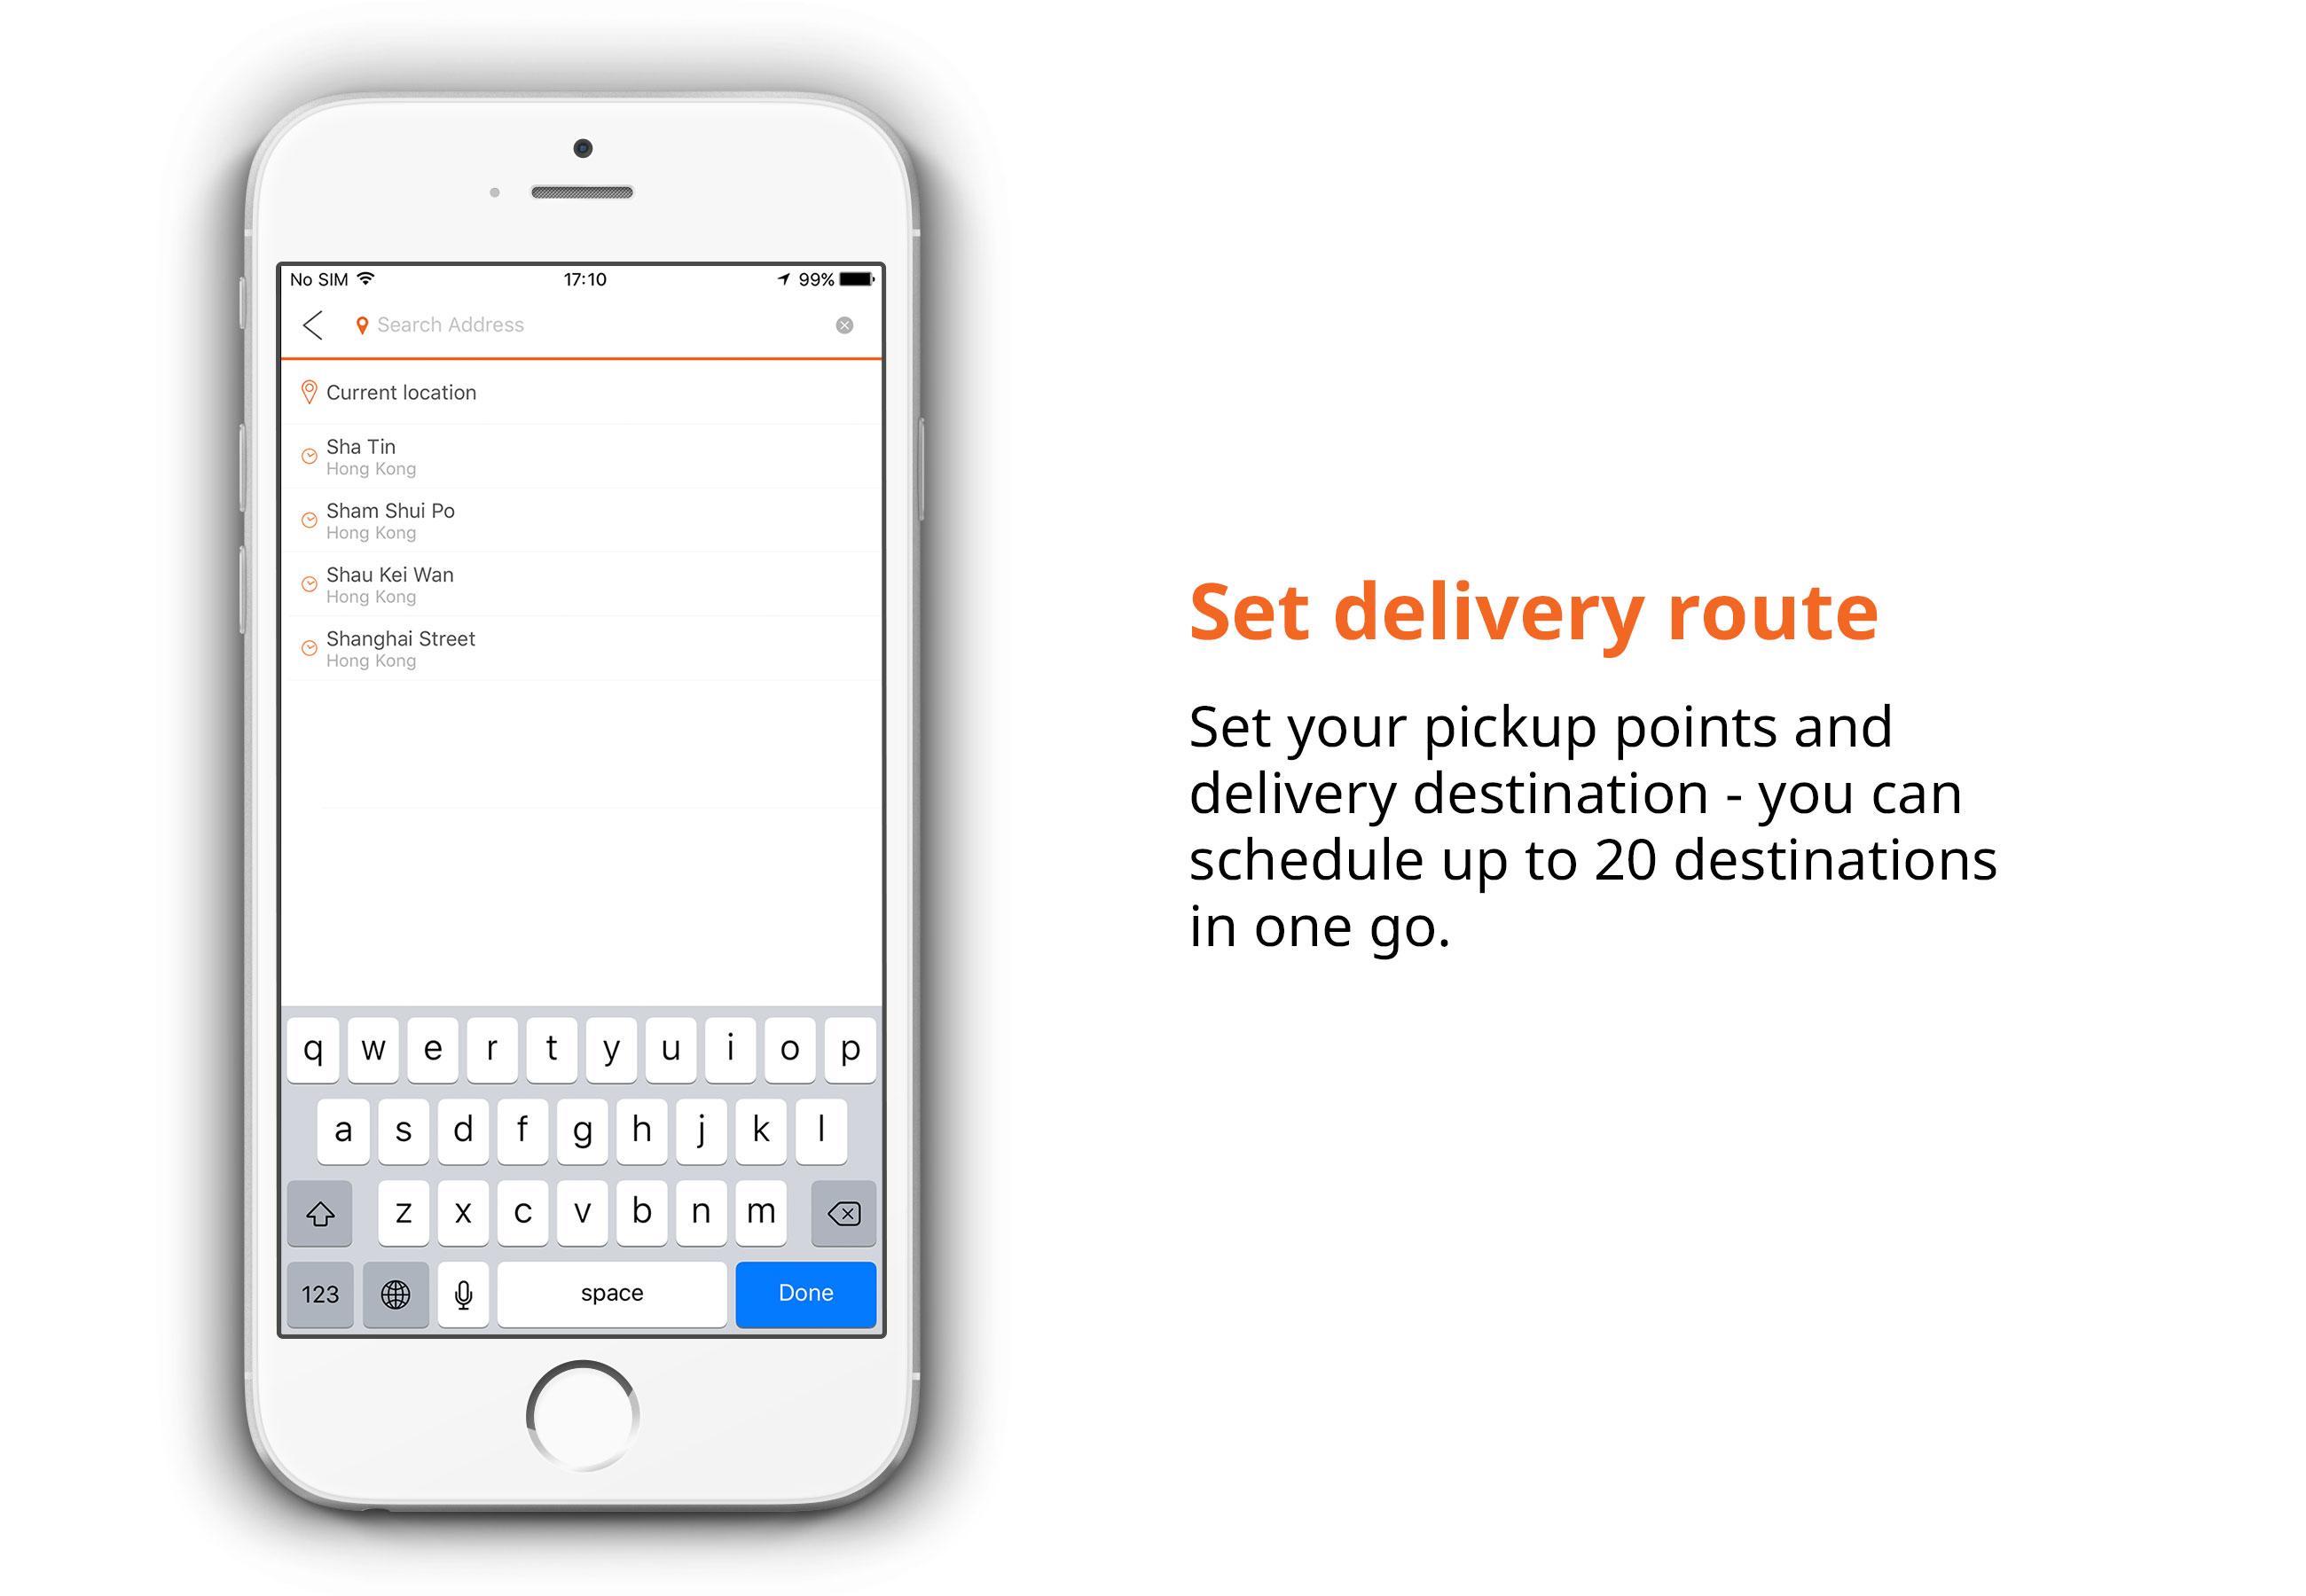 Lalamove hongkong set delivery route